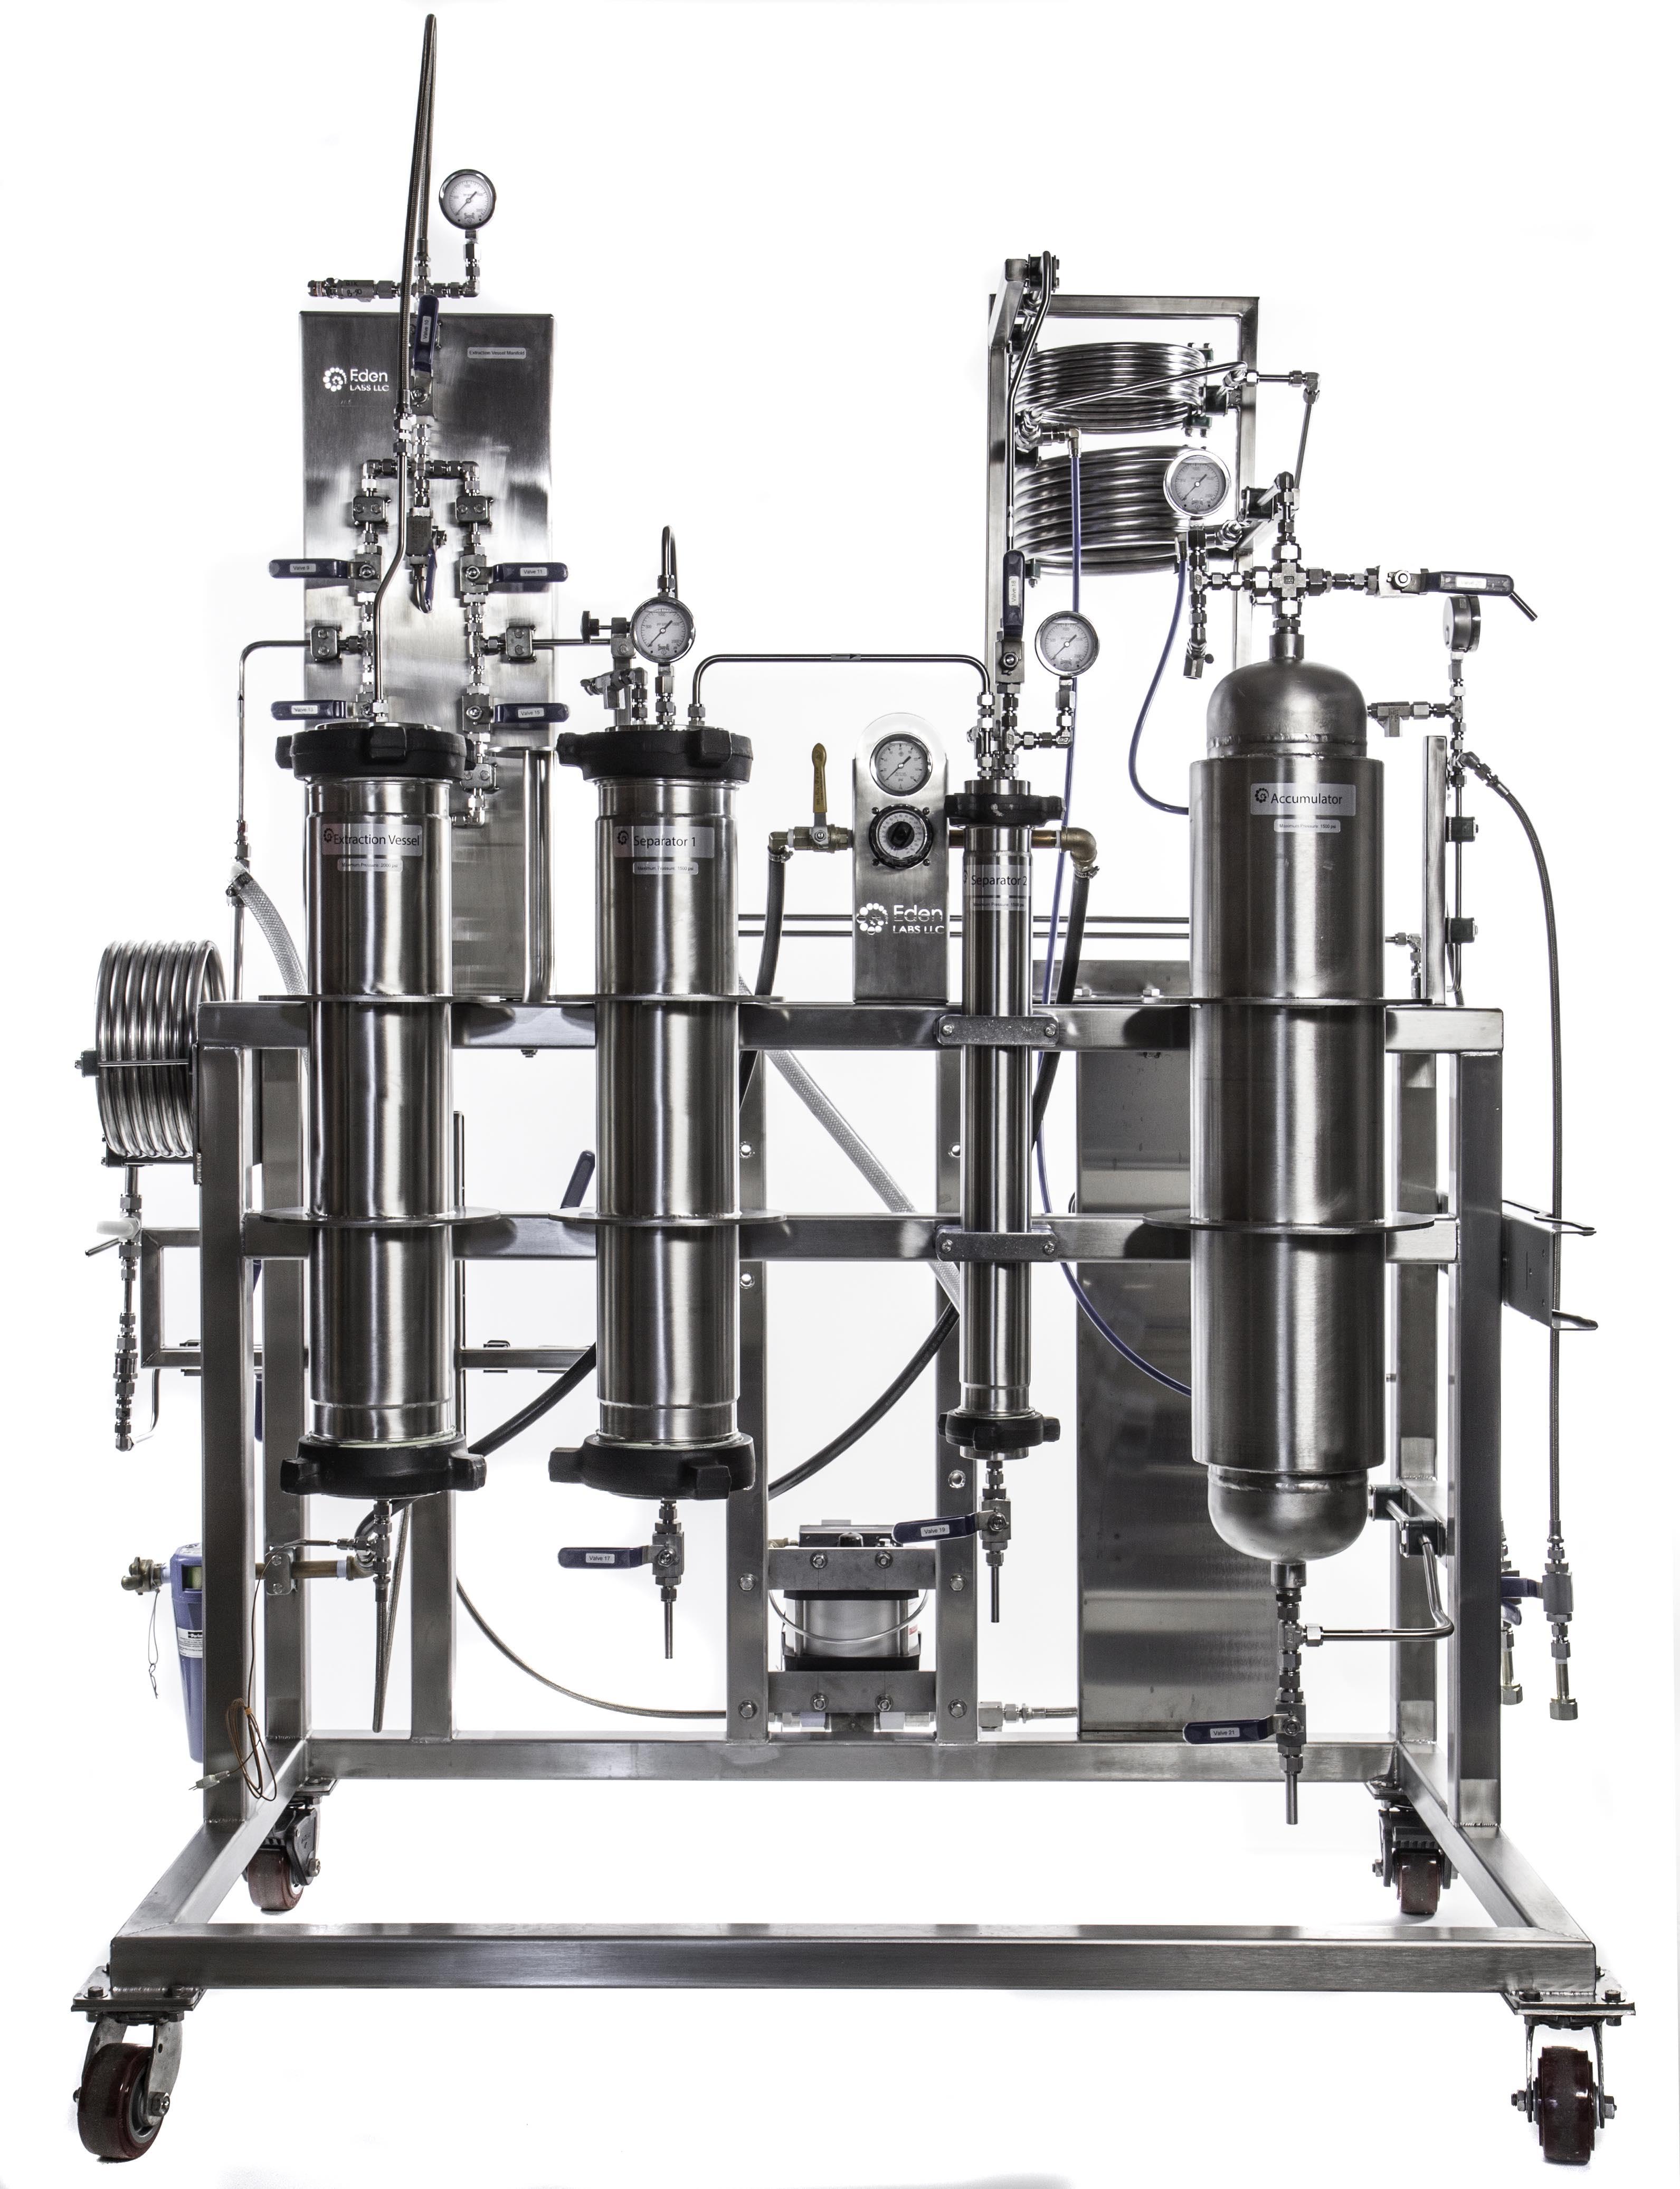 Eden Labs Co2 Extraction Equipment 20l 2k